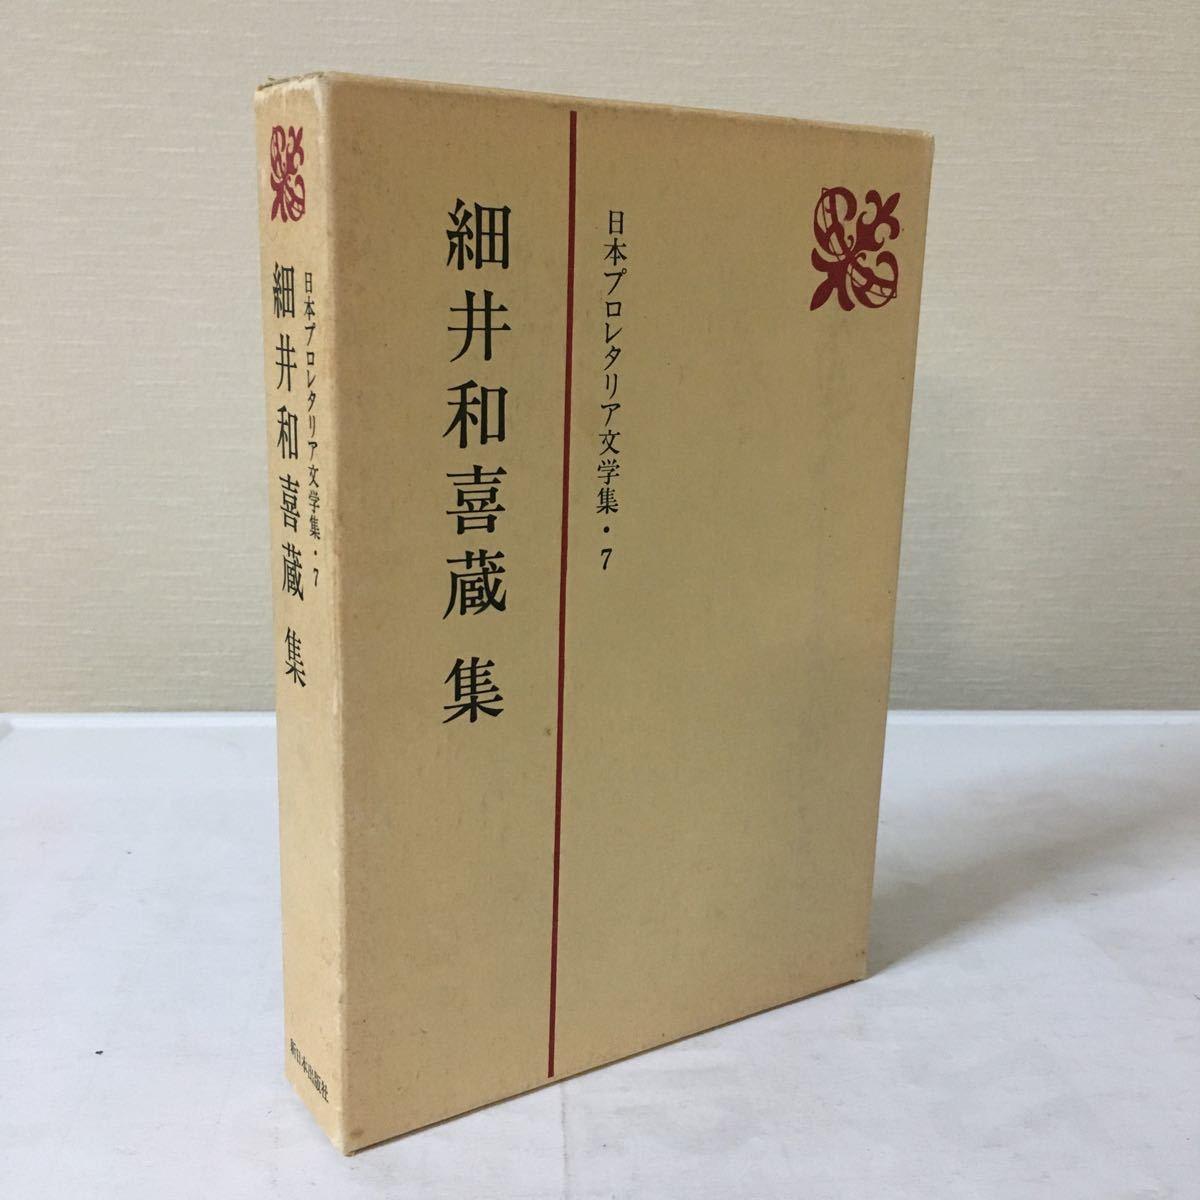 日本プロレタリア文学集 7 細井和喜蔵集 1985年初版 新日本出版社